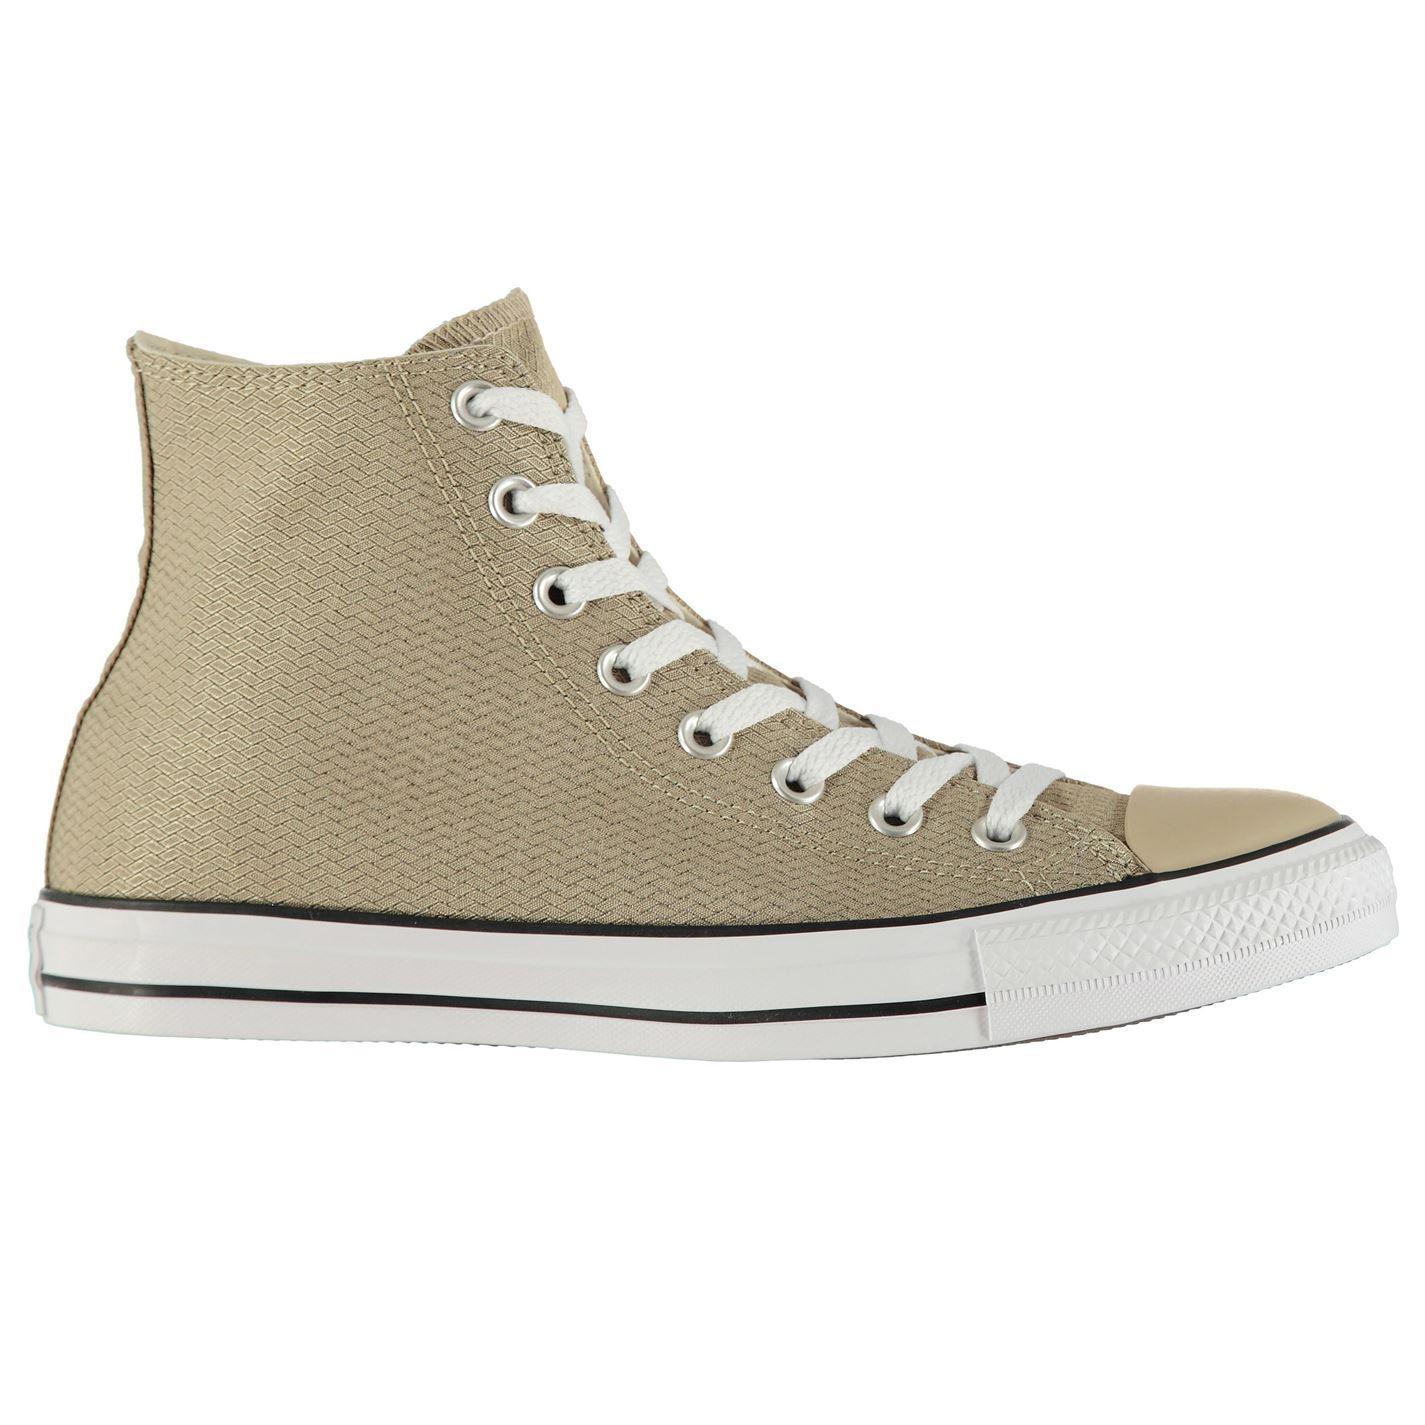 Converse All Star Court Ripstop Ripstop Ripstop Trainers Mens Athleisure Footwear scarpe scarpe da ginnastica 977f83